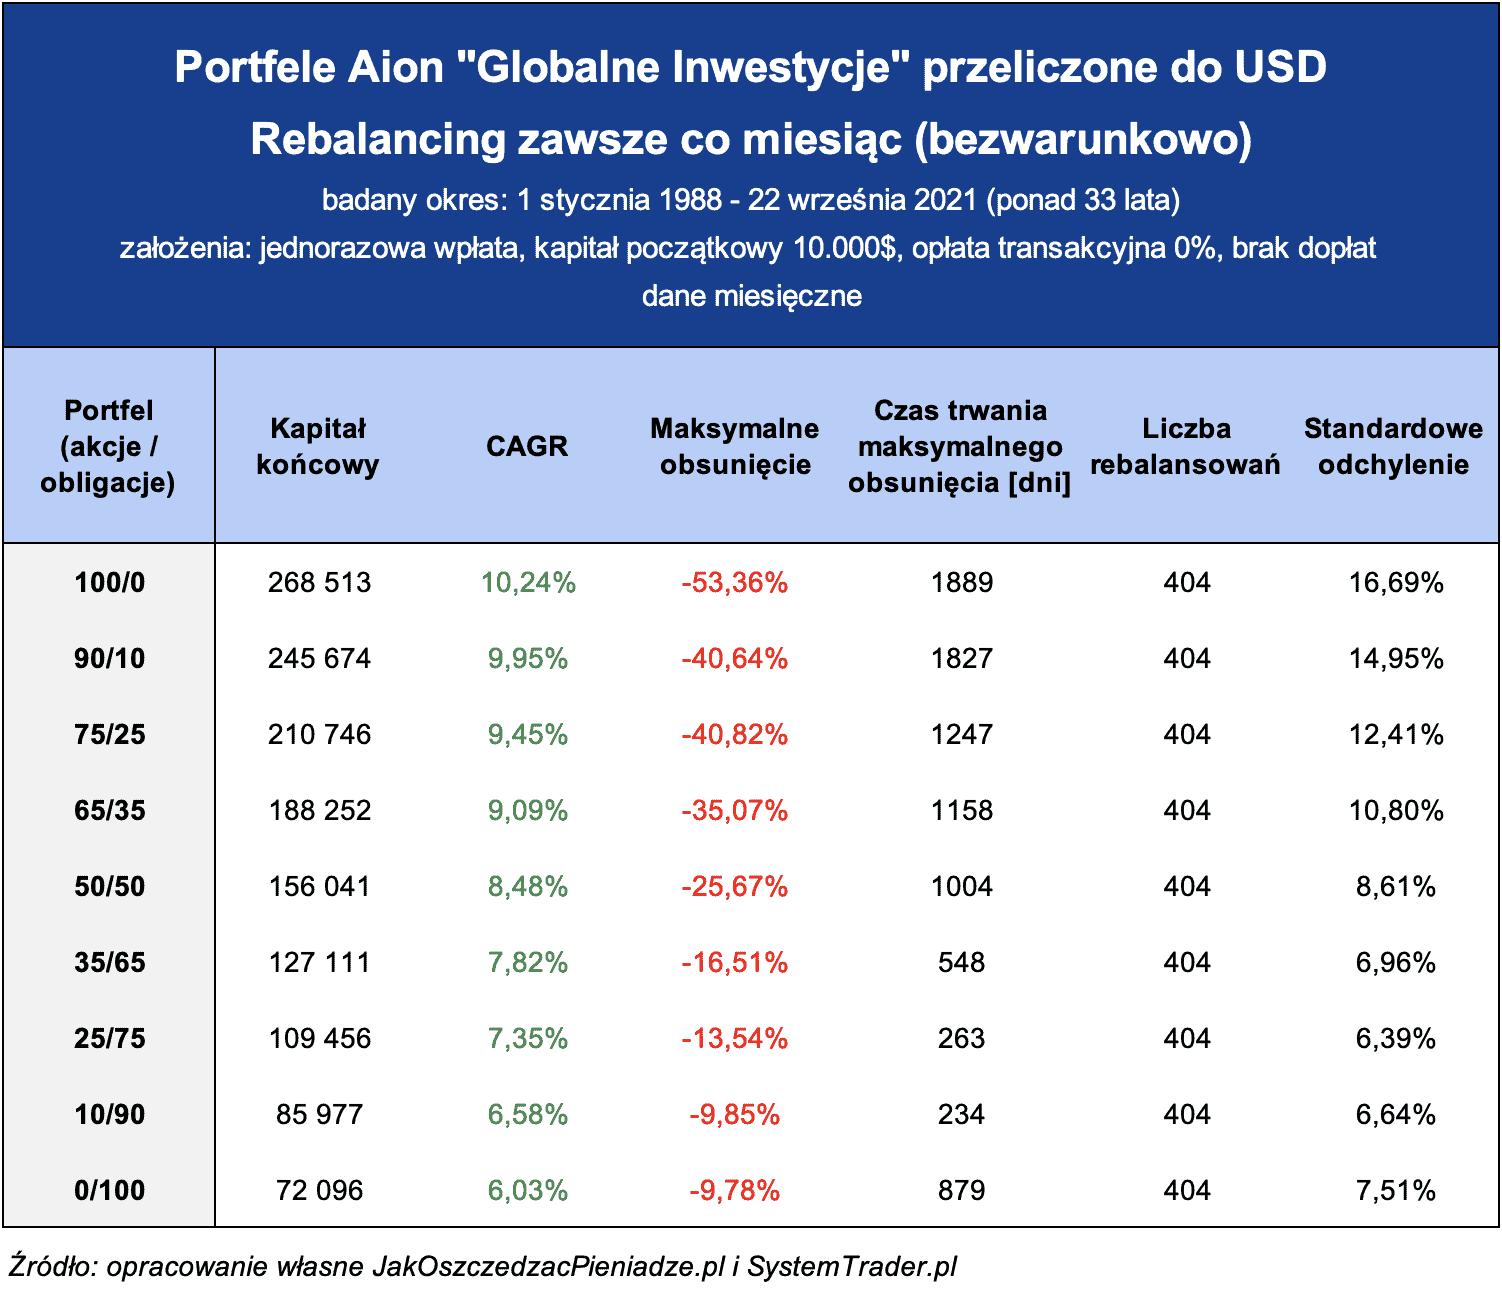 Aion Globalne Inwestycje USD rebalacing co miesiac